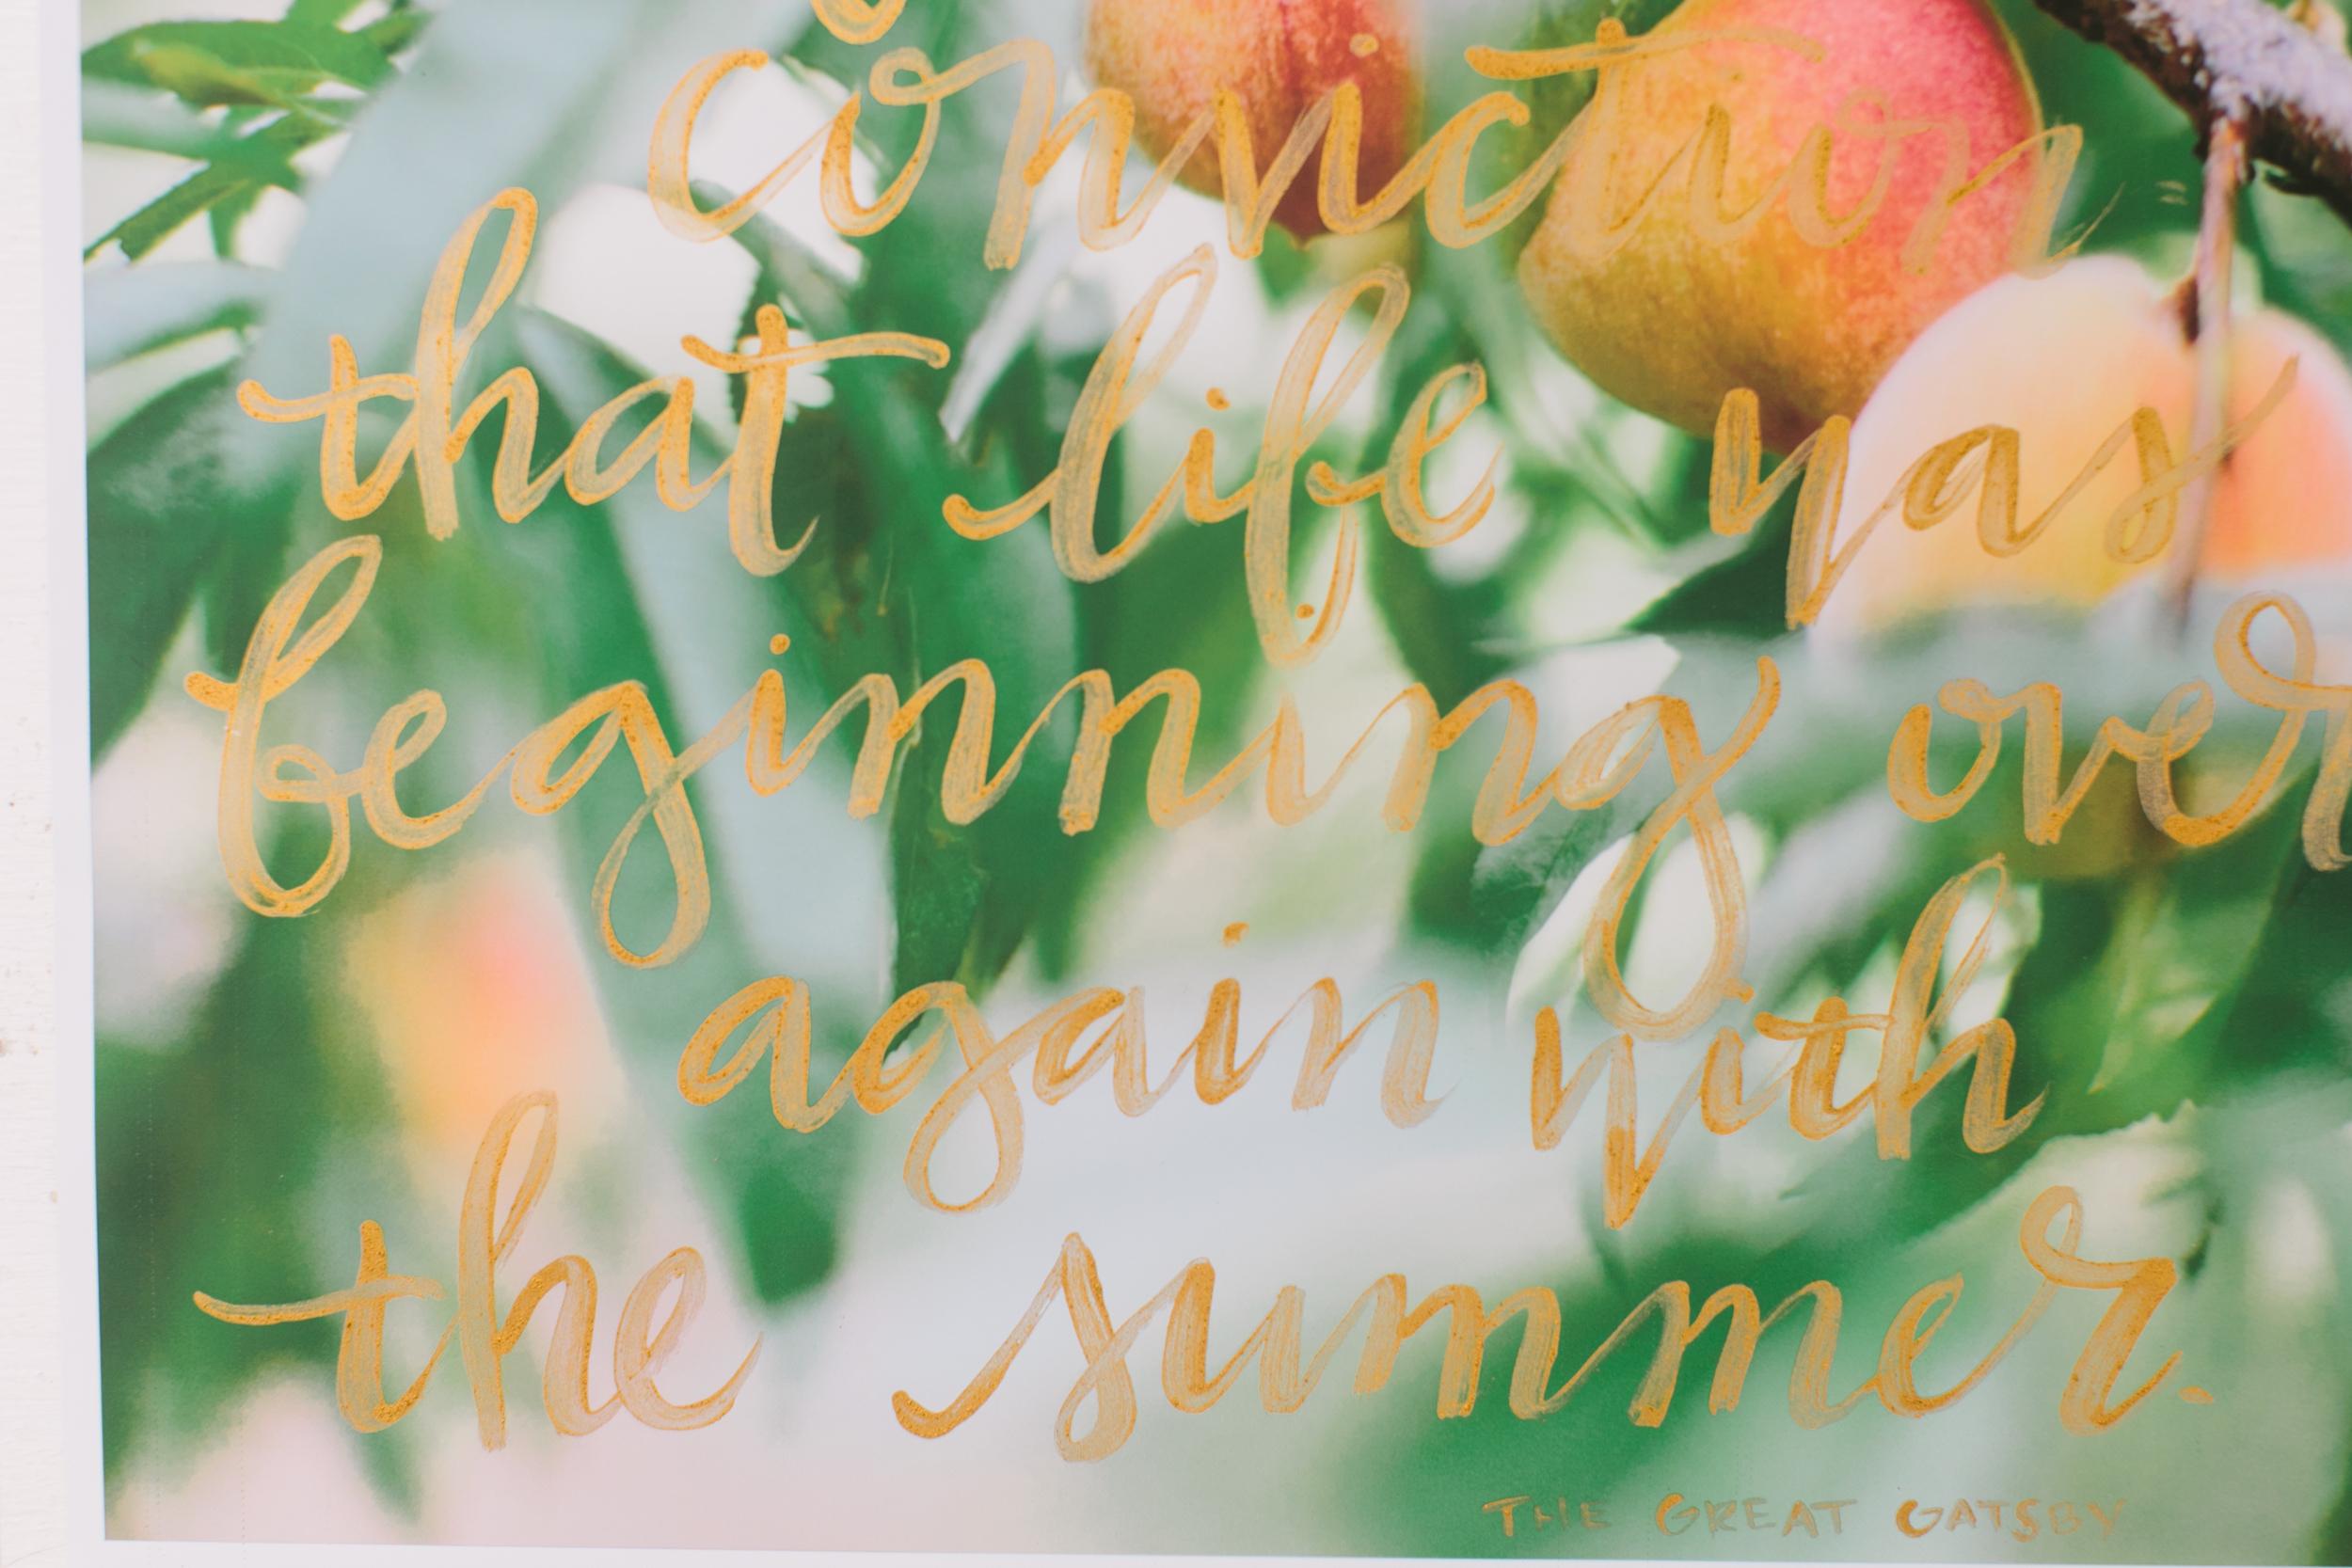 Kathryn-McCrary-Photography-Jenn-Gietzen-Write-On-Designs-Market-Collab-Peaches-118.jpg